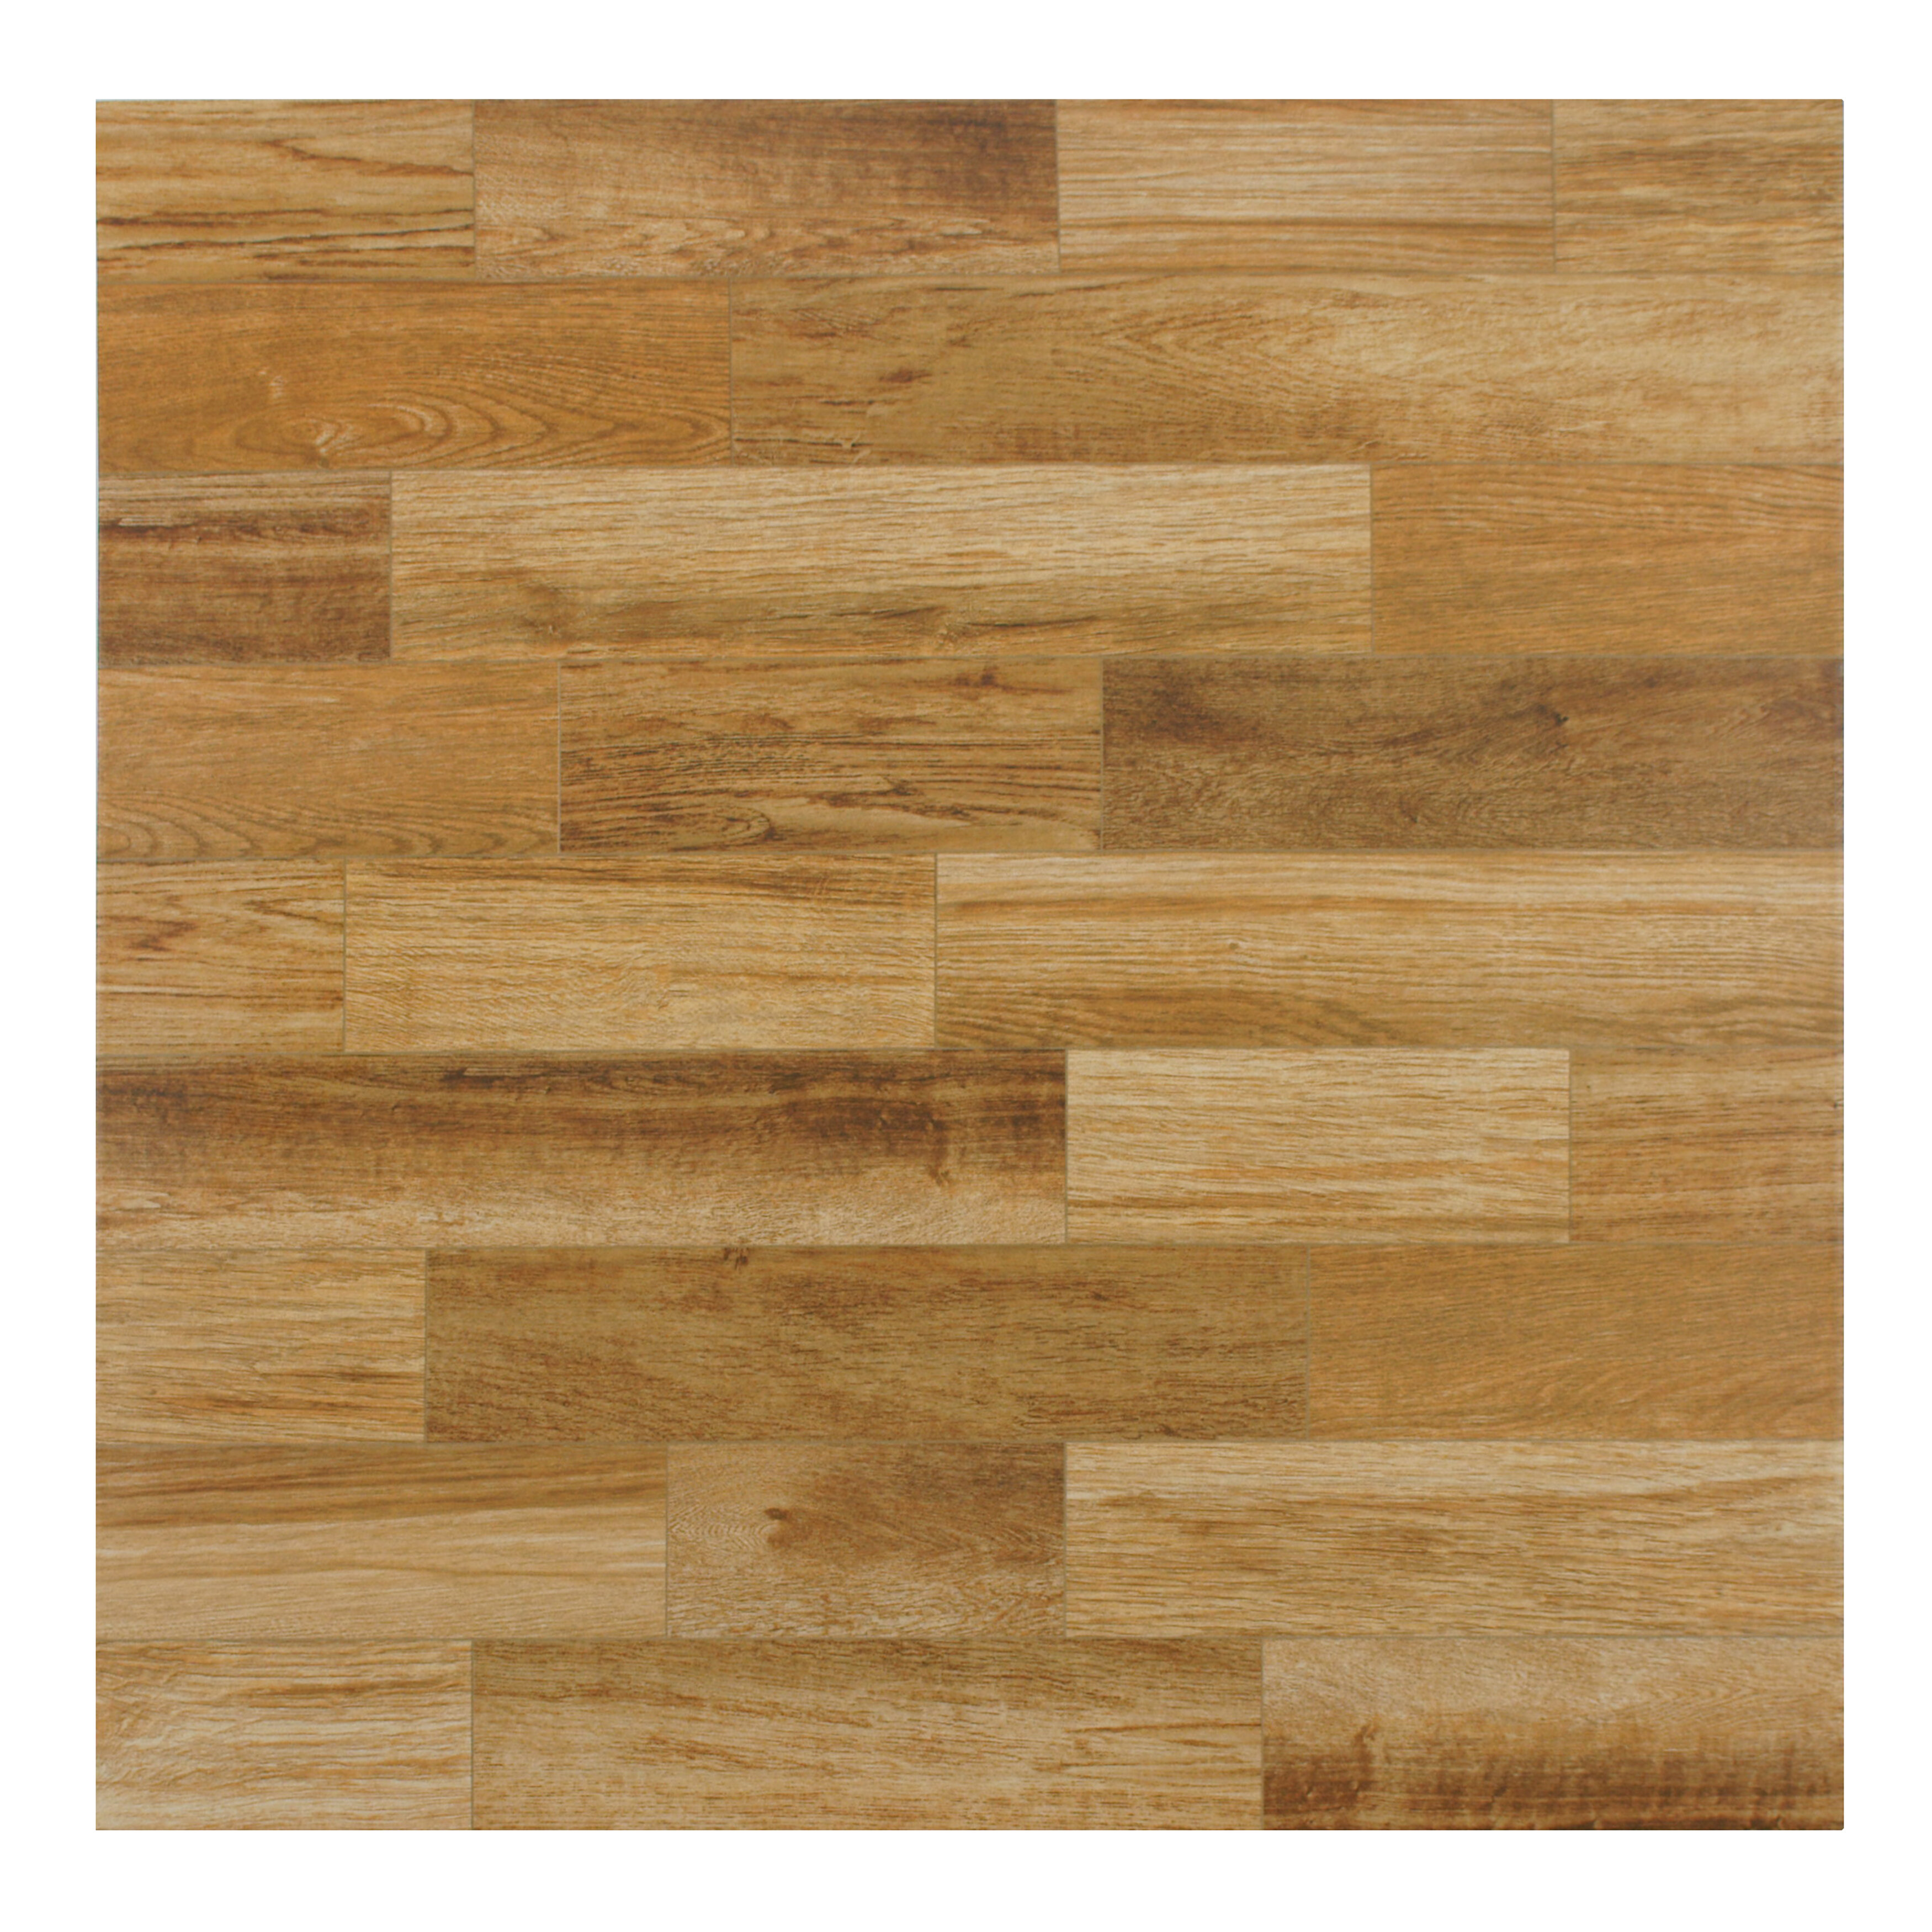 Elitetile prospero 1775 x 1775 ceramic wood tile in brown elitetile prospero 1775 x 1775 ceramic wood tile in brown reviews wayfair dailygadgetfo Image collections